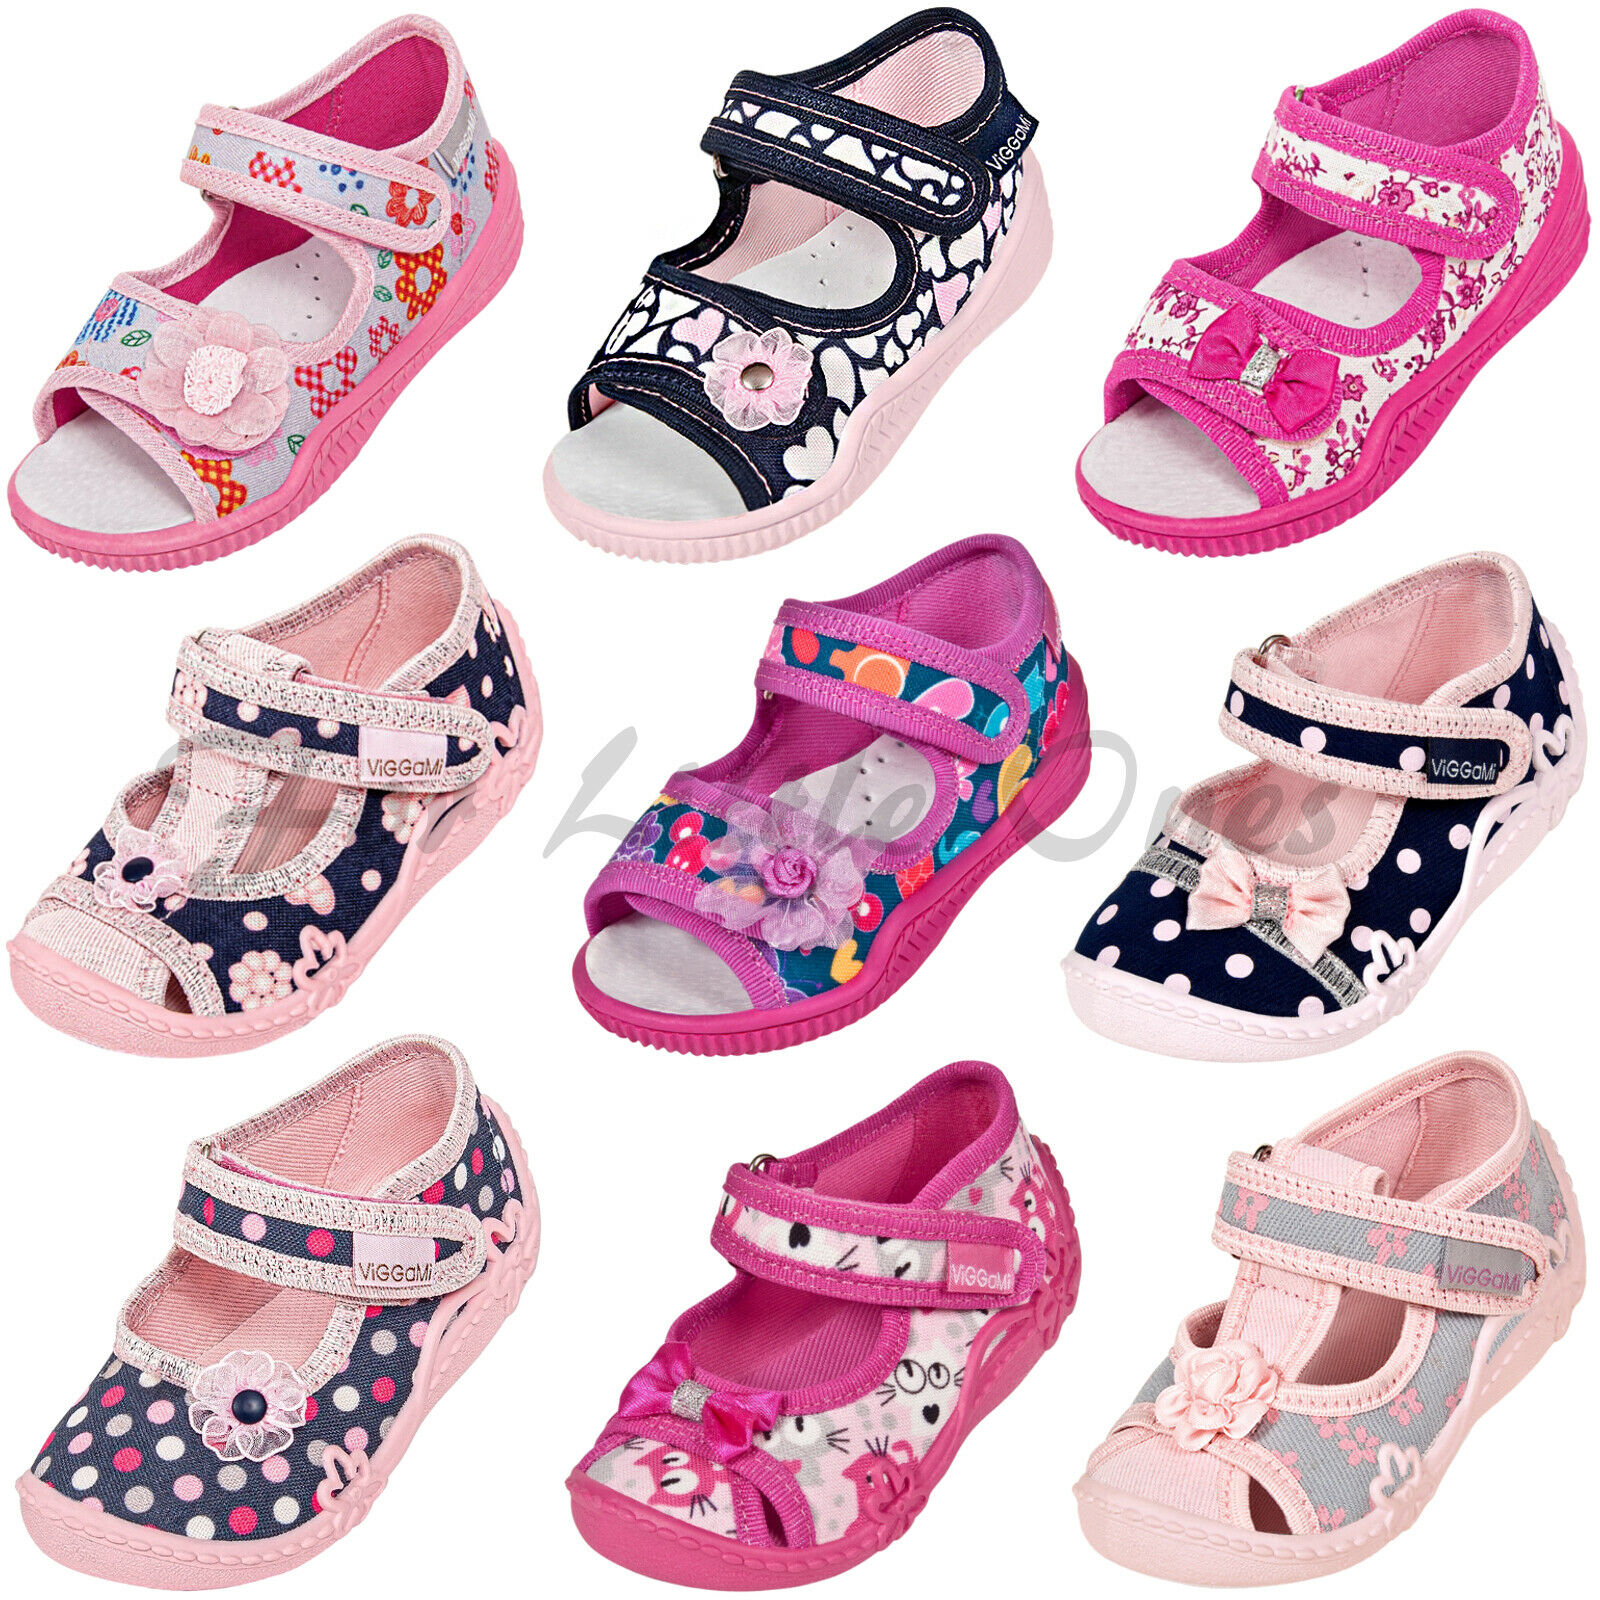 adidas Baby Girls' Altaswim Sandals 8